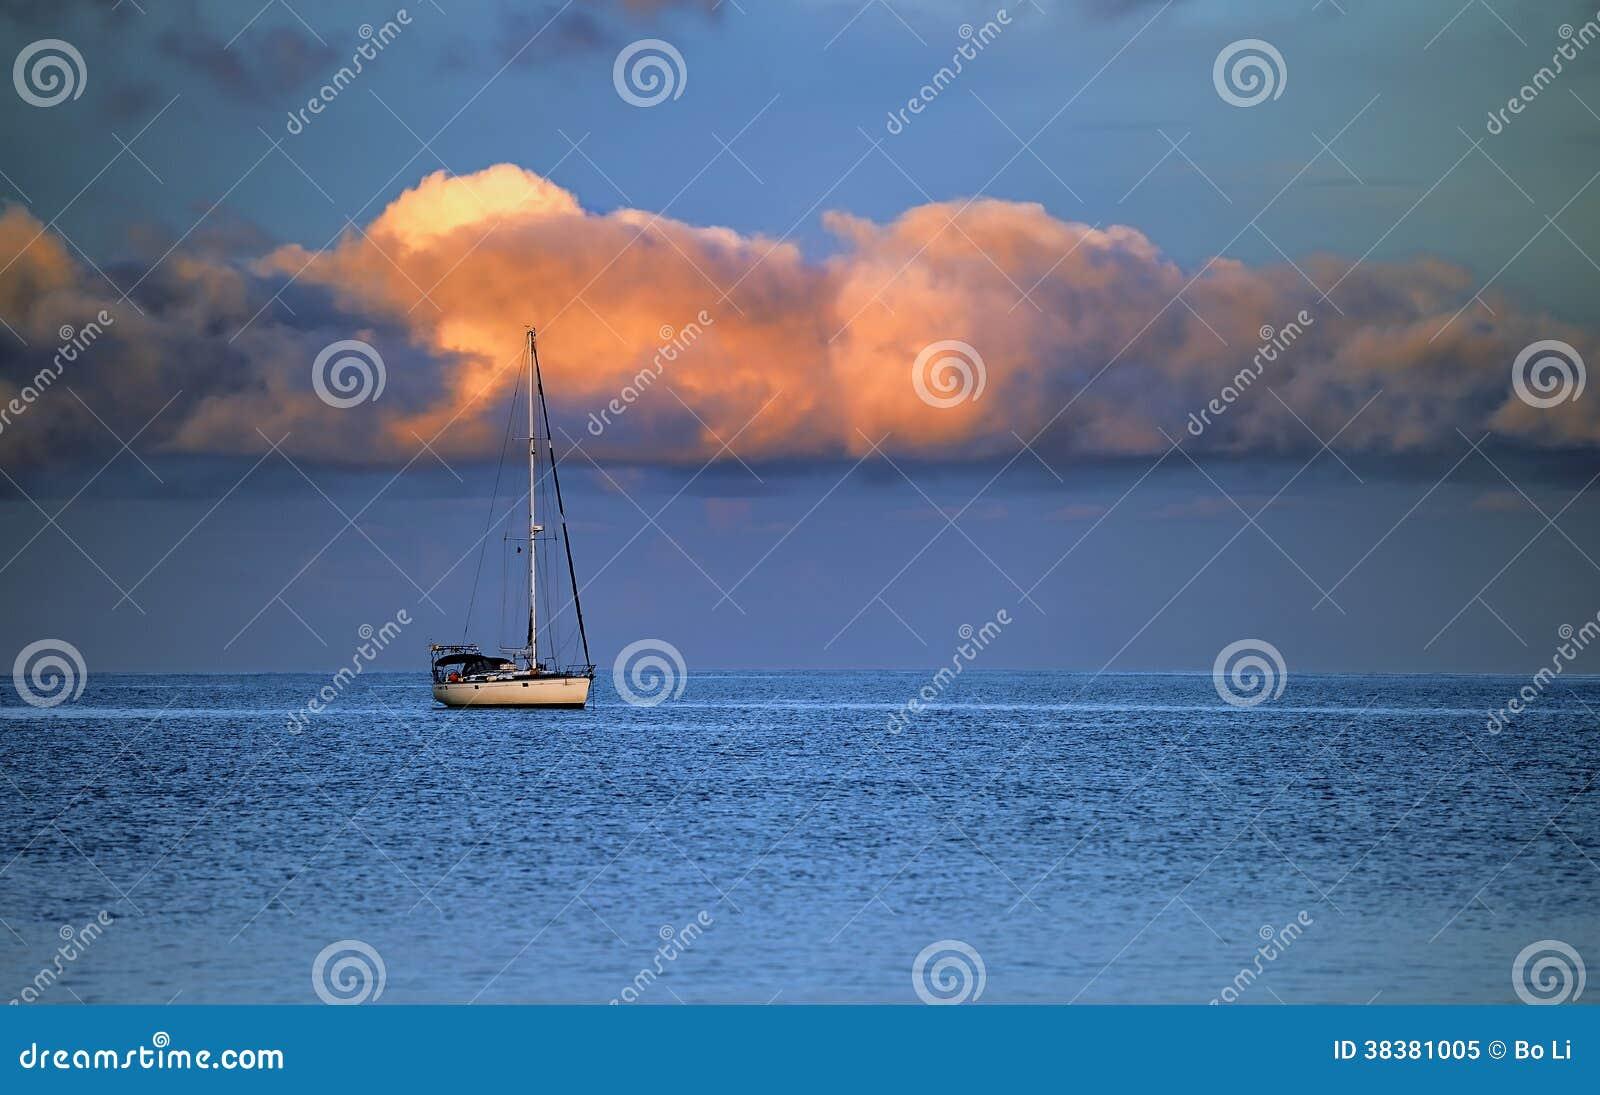 Jacht, morze i chmura,